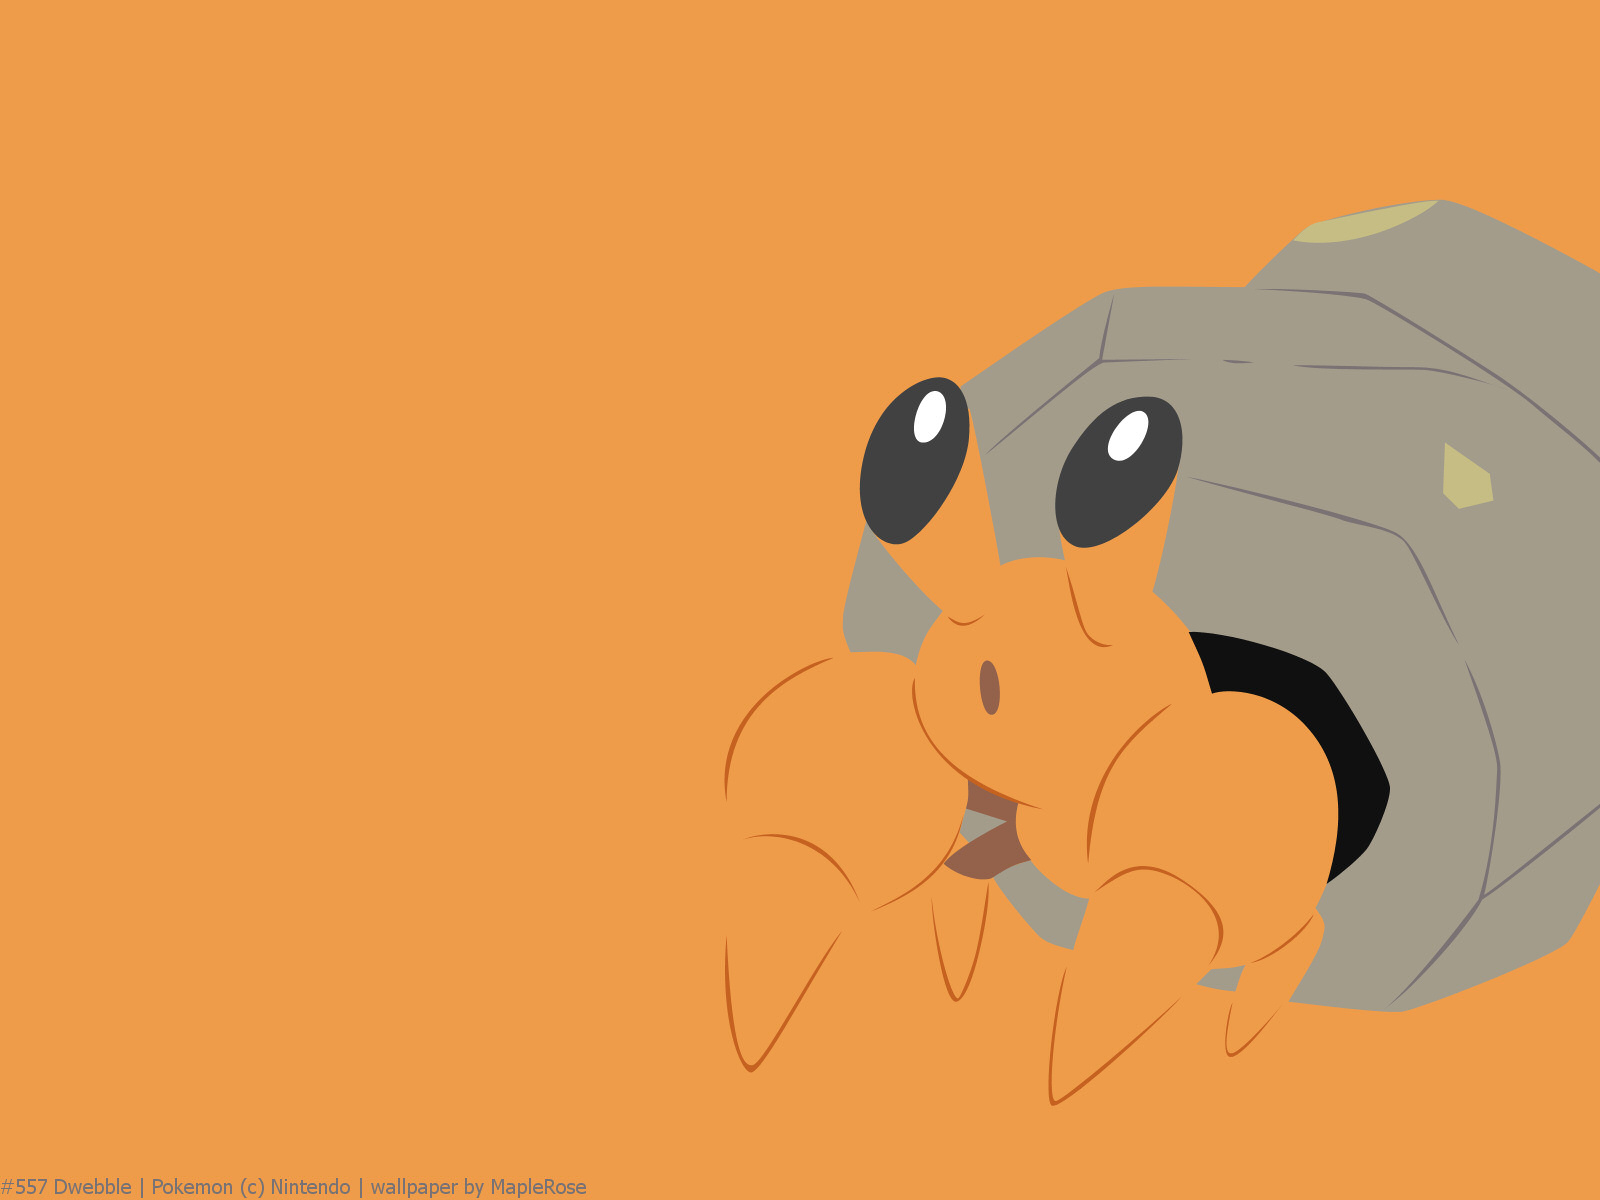 Pokemon Dwebble Evolution Images   Pokemon Images